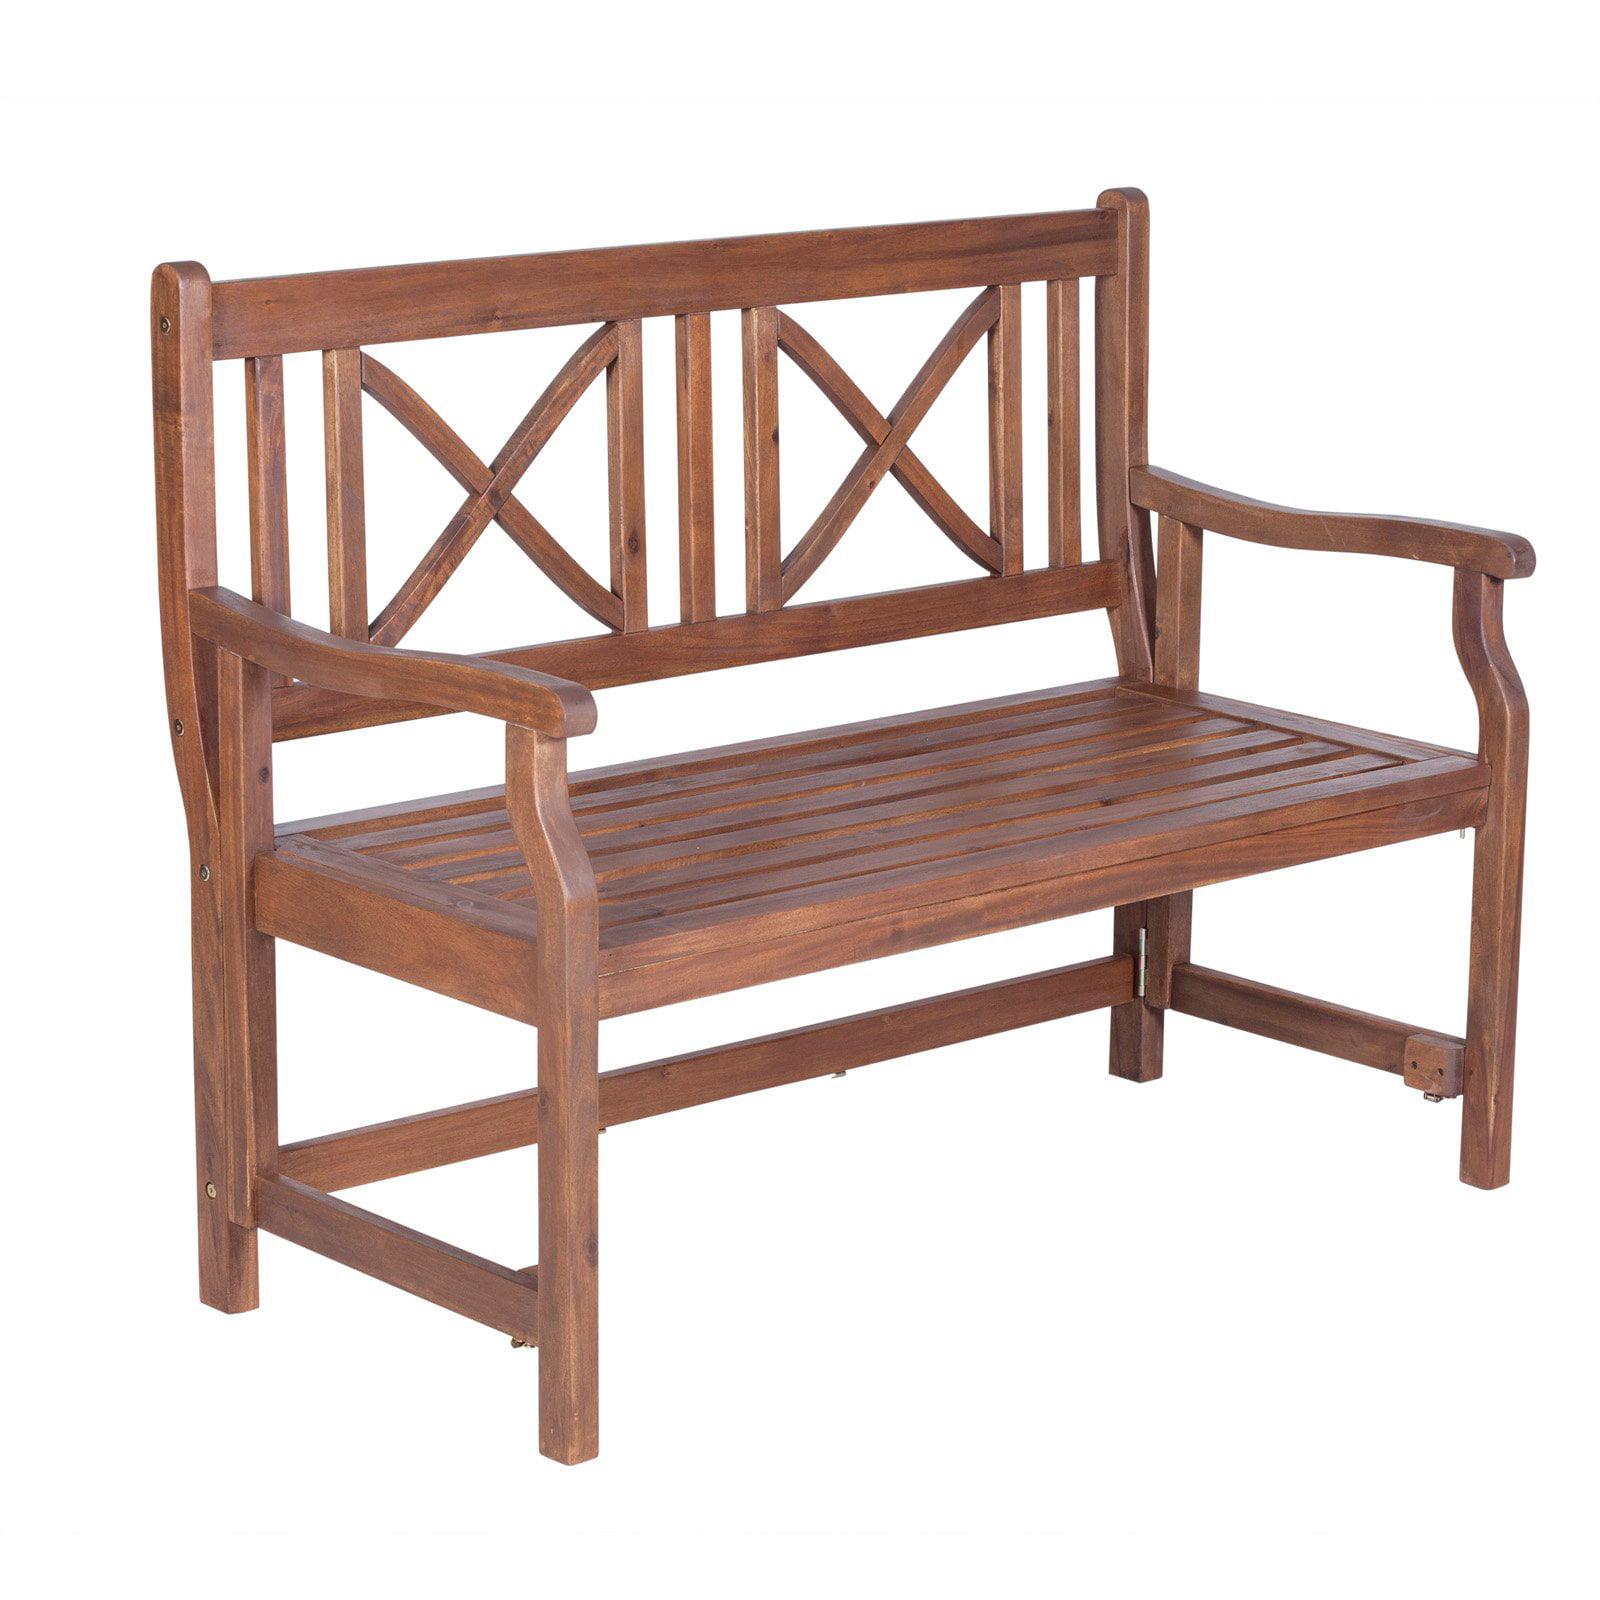 Walker Edison 48 in. Outdoor Acacia Wood Folding Bench by Walker Edison Furniture Company, LLC